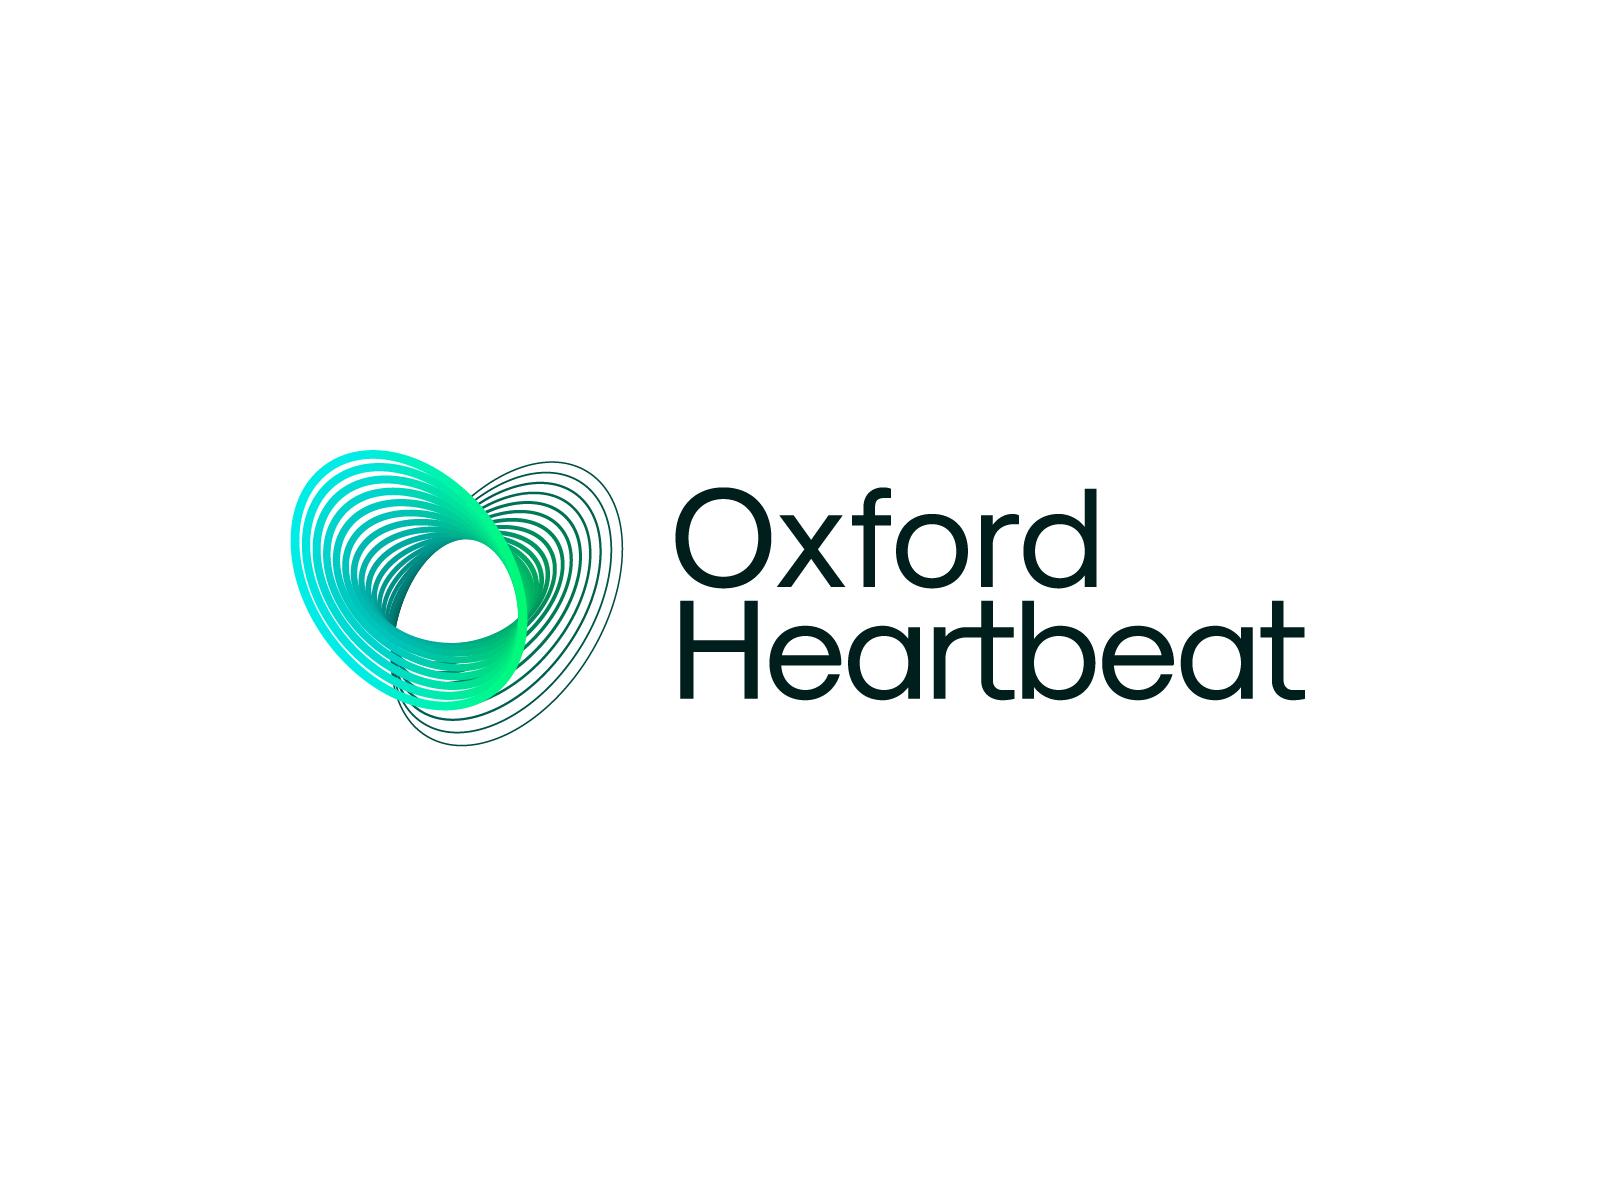 Oxford Heartbeat – Logo Design